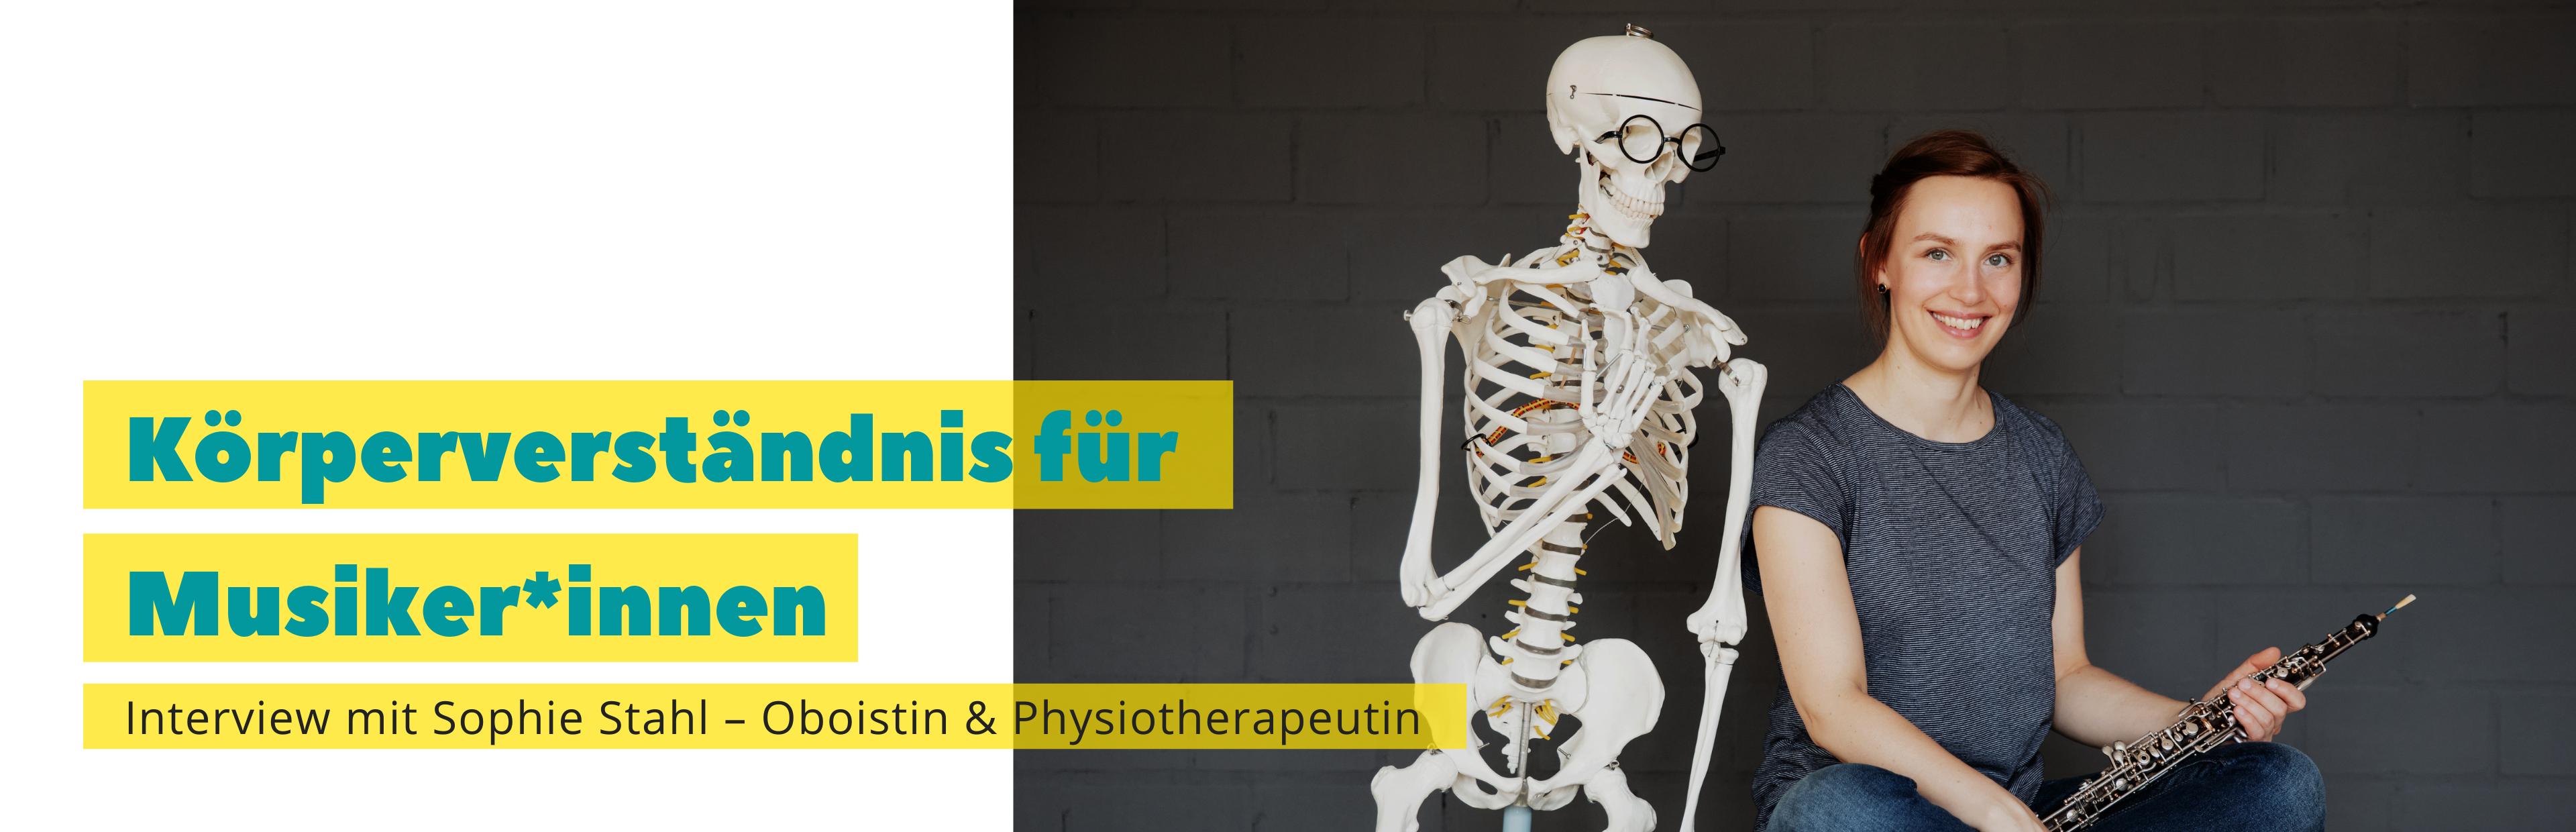 Oboistin Physiotherapeutin Sophie Stahl